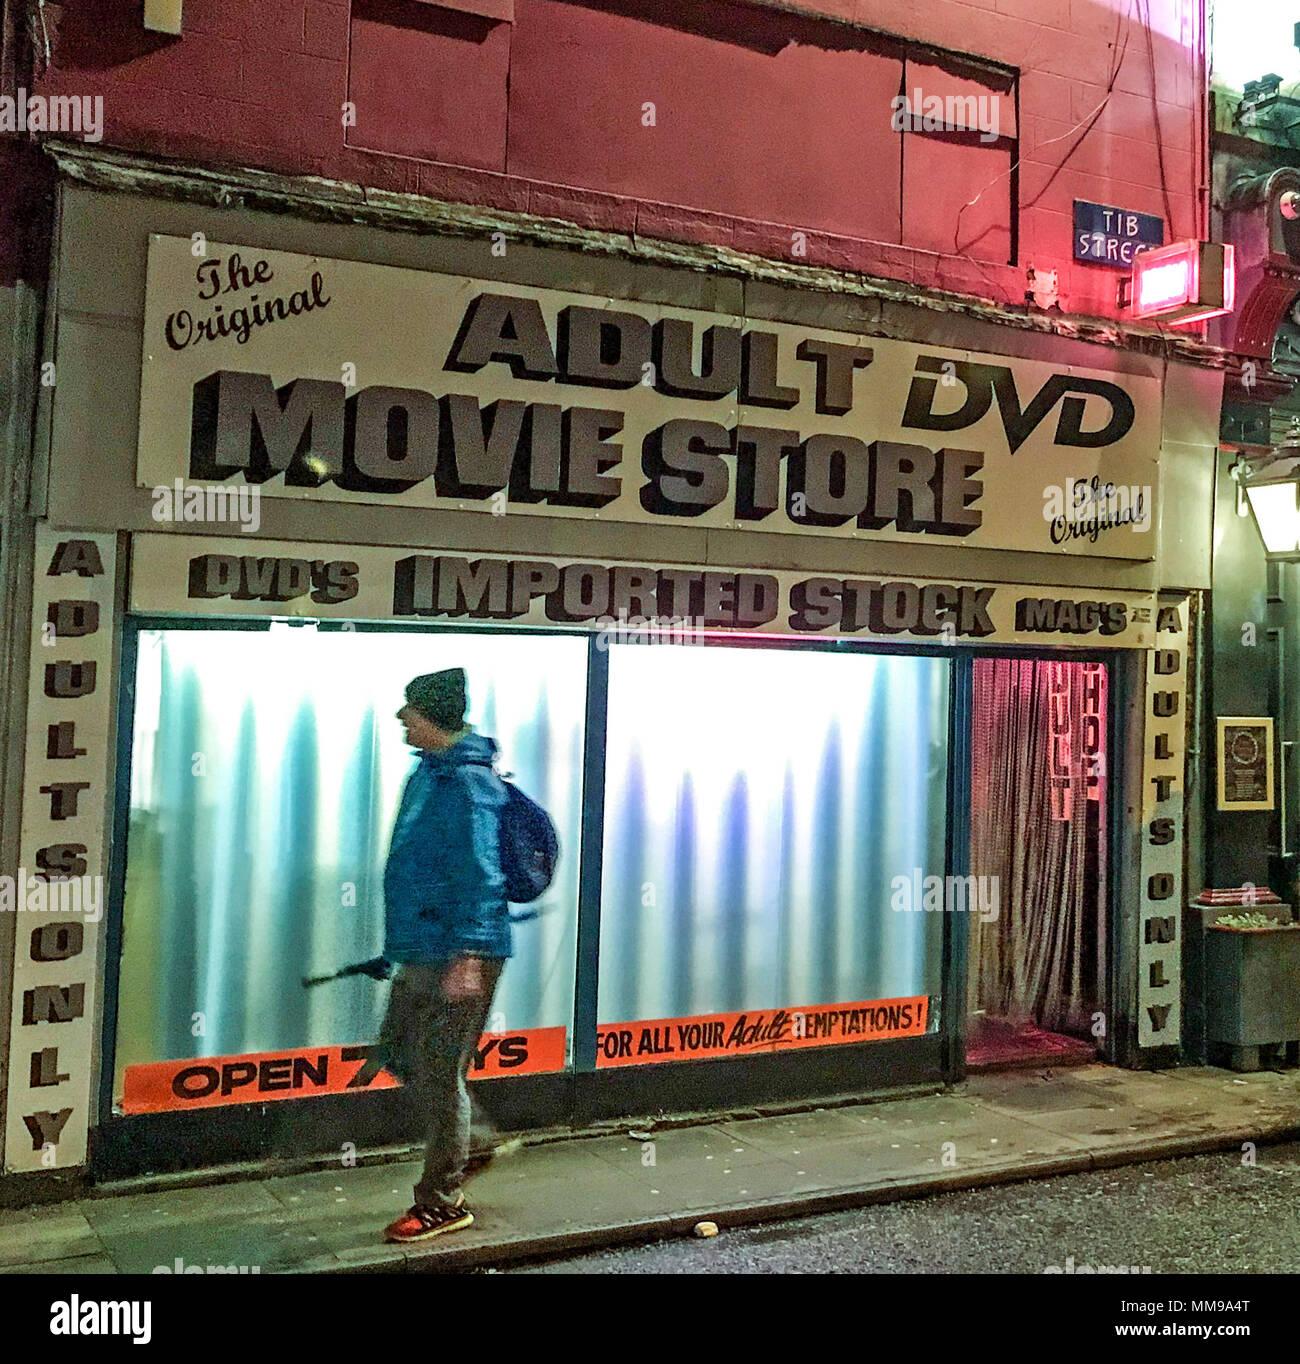 GoTonysmith,@HotpixUK,Adult,DVD,Movie Store,Movie,Store,Tib St,Tib,Manchester,Lancs,England,UK,GB,Sex,Shop,man,outside,looking,in,man looking in,Movie store,adult,adults,only,adults only,imported,stock,sex aids,aid,aids,Tib St Adult Shop,shops,seedy,The Original,the,original,night,evening,dusk